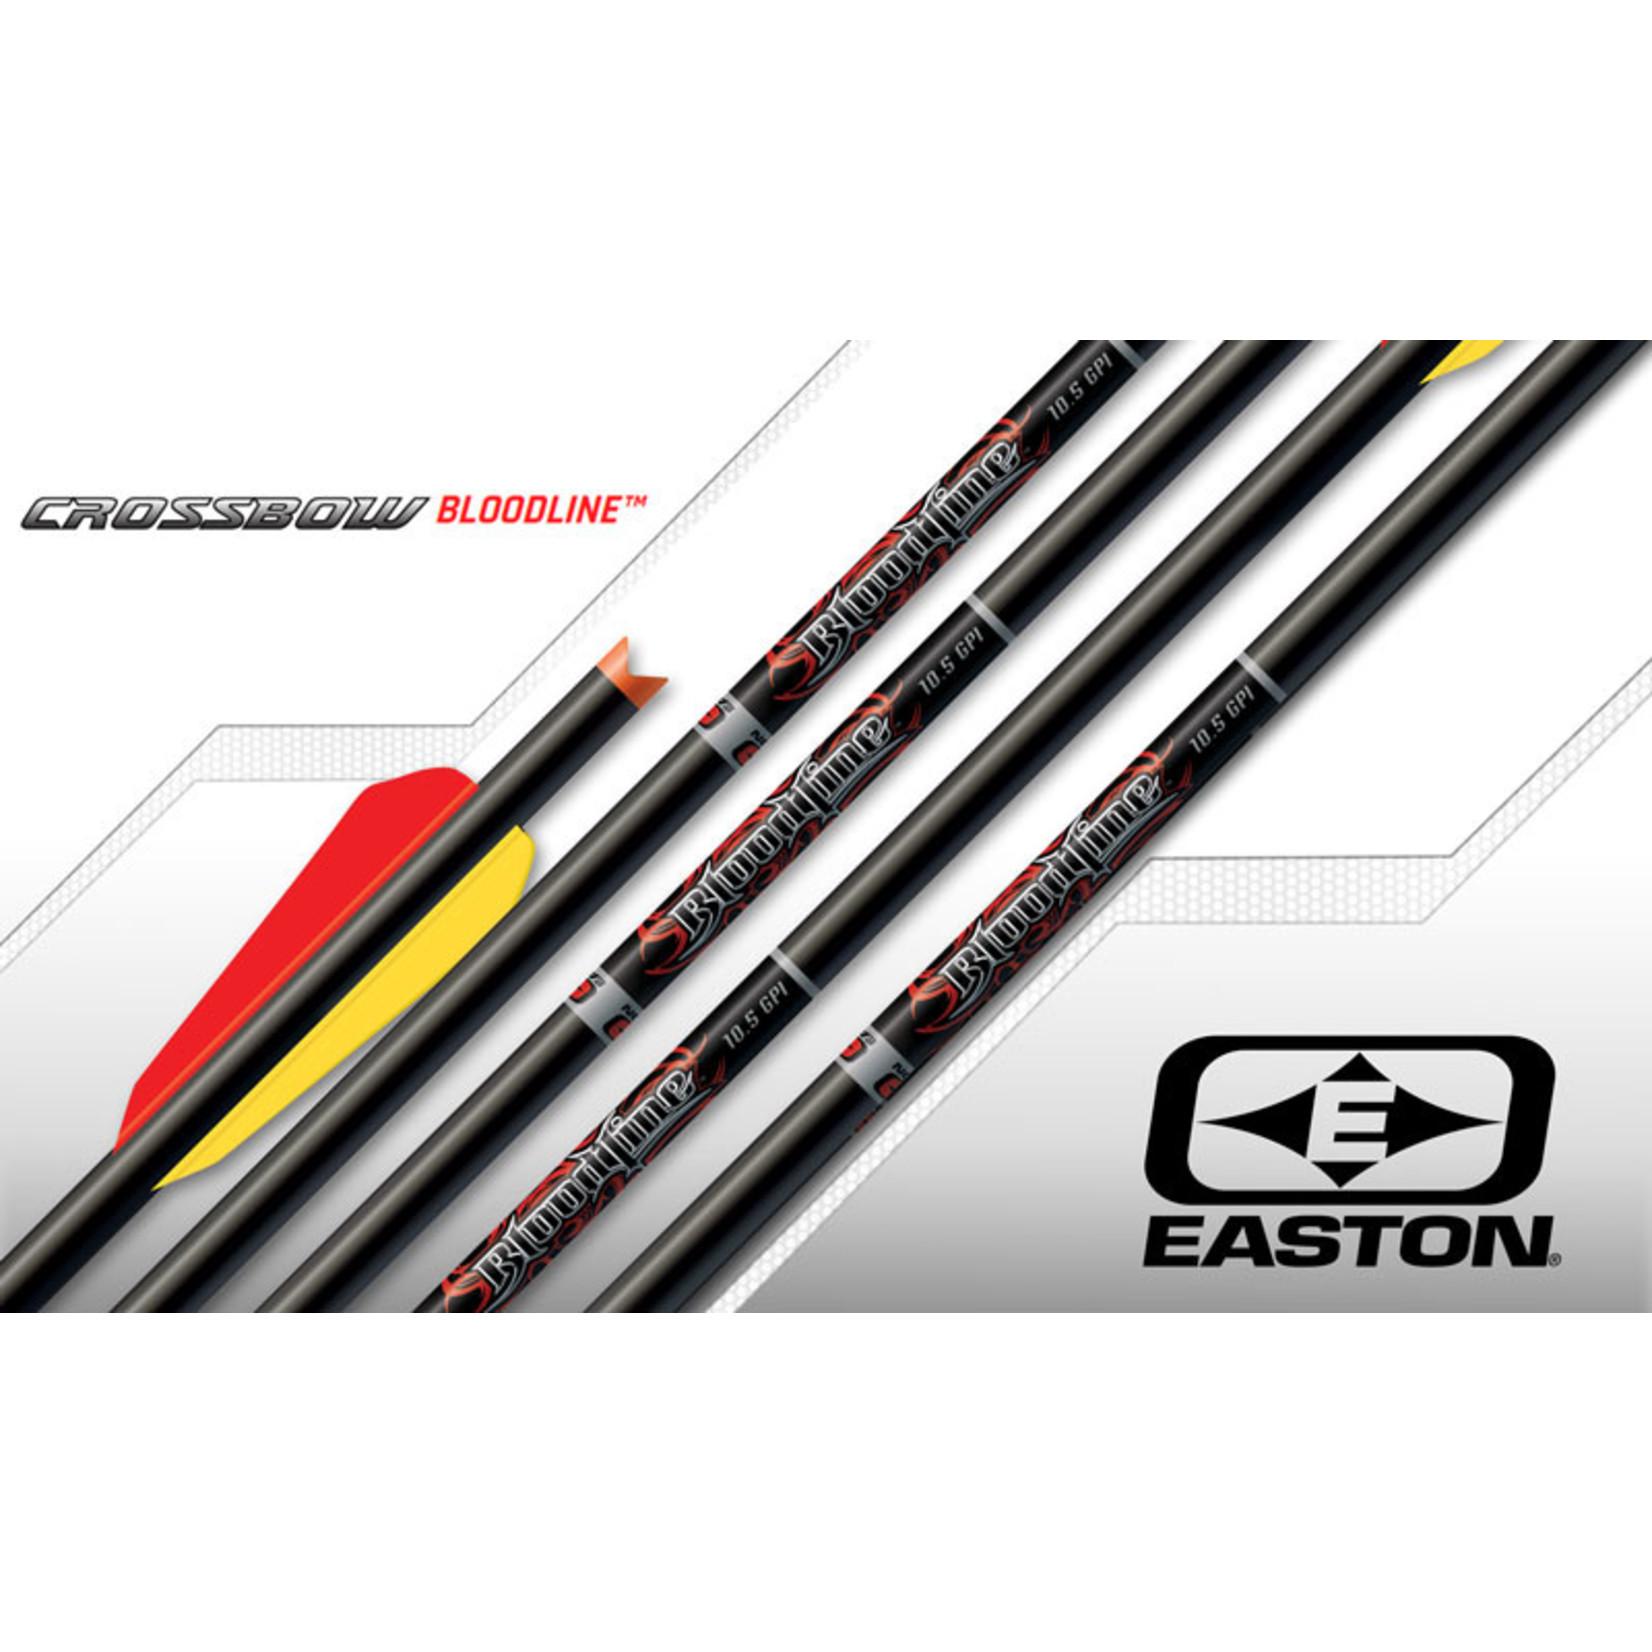 Crossbow Arrows Bloodline Carbon 22''M/N 4''Vanes